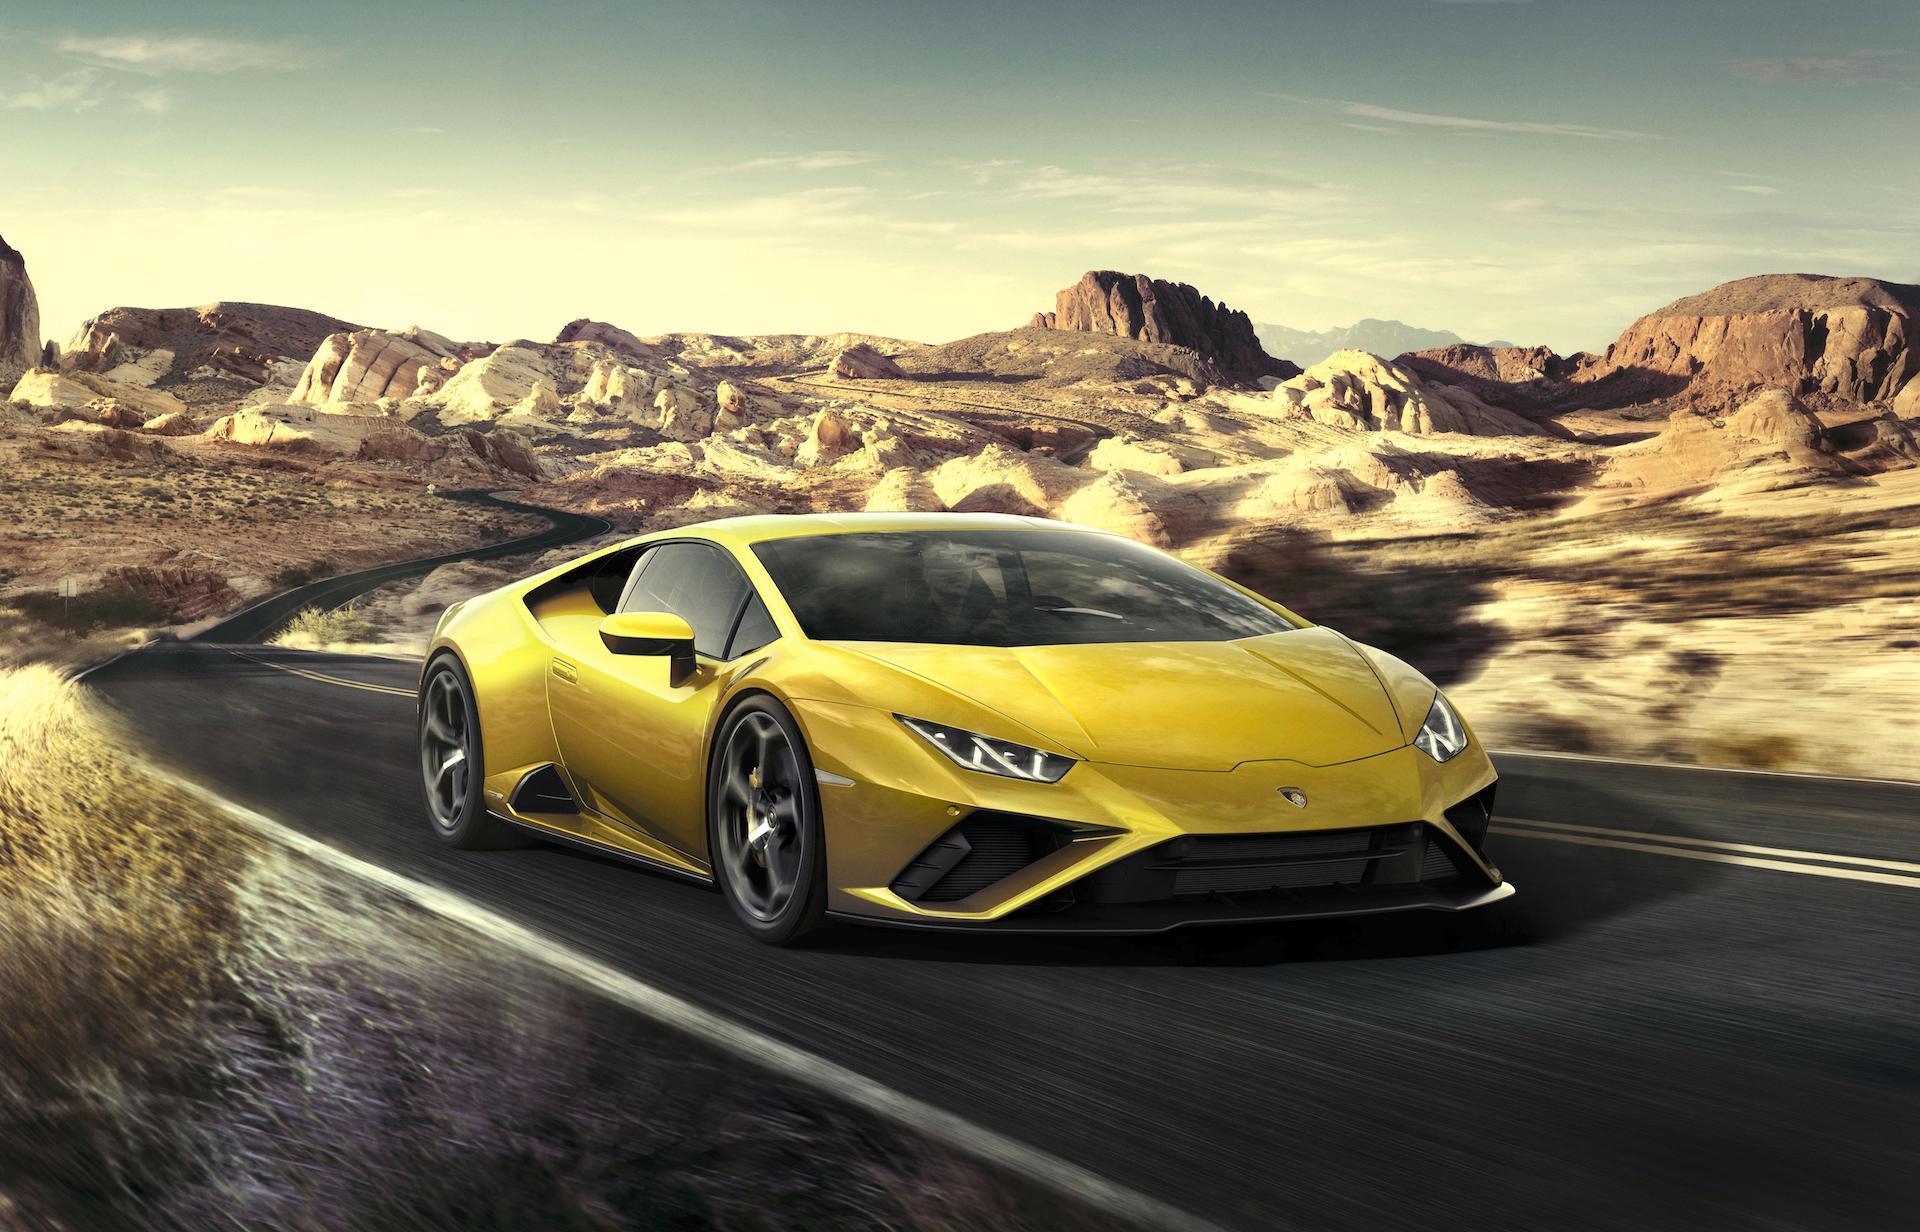 Car To Go >> Rear Wheel Drive Lamborghini Huracan Evo Is Ready To Go Drifting